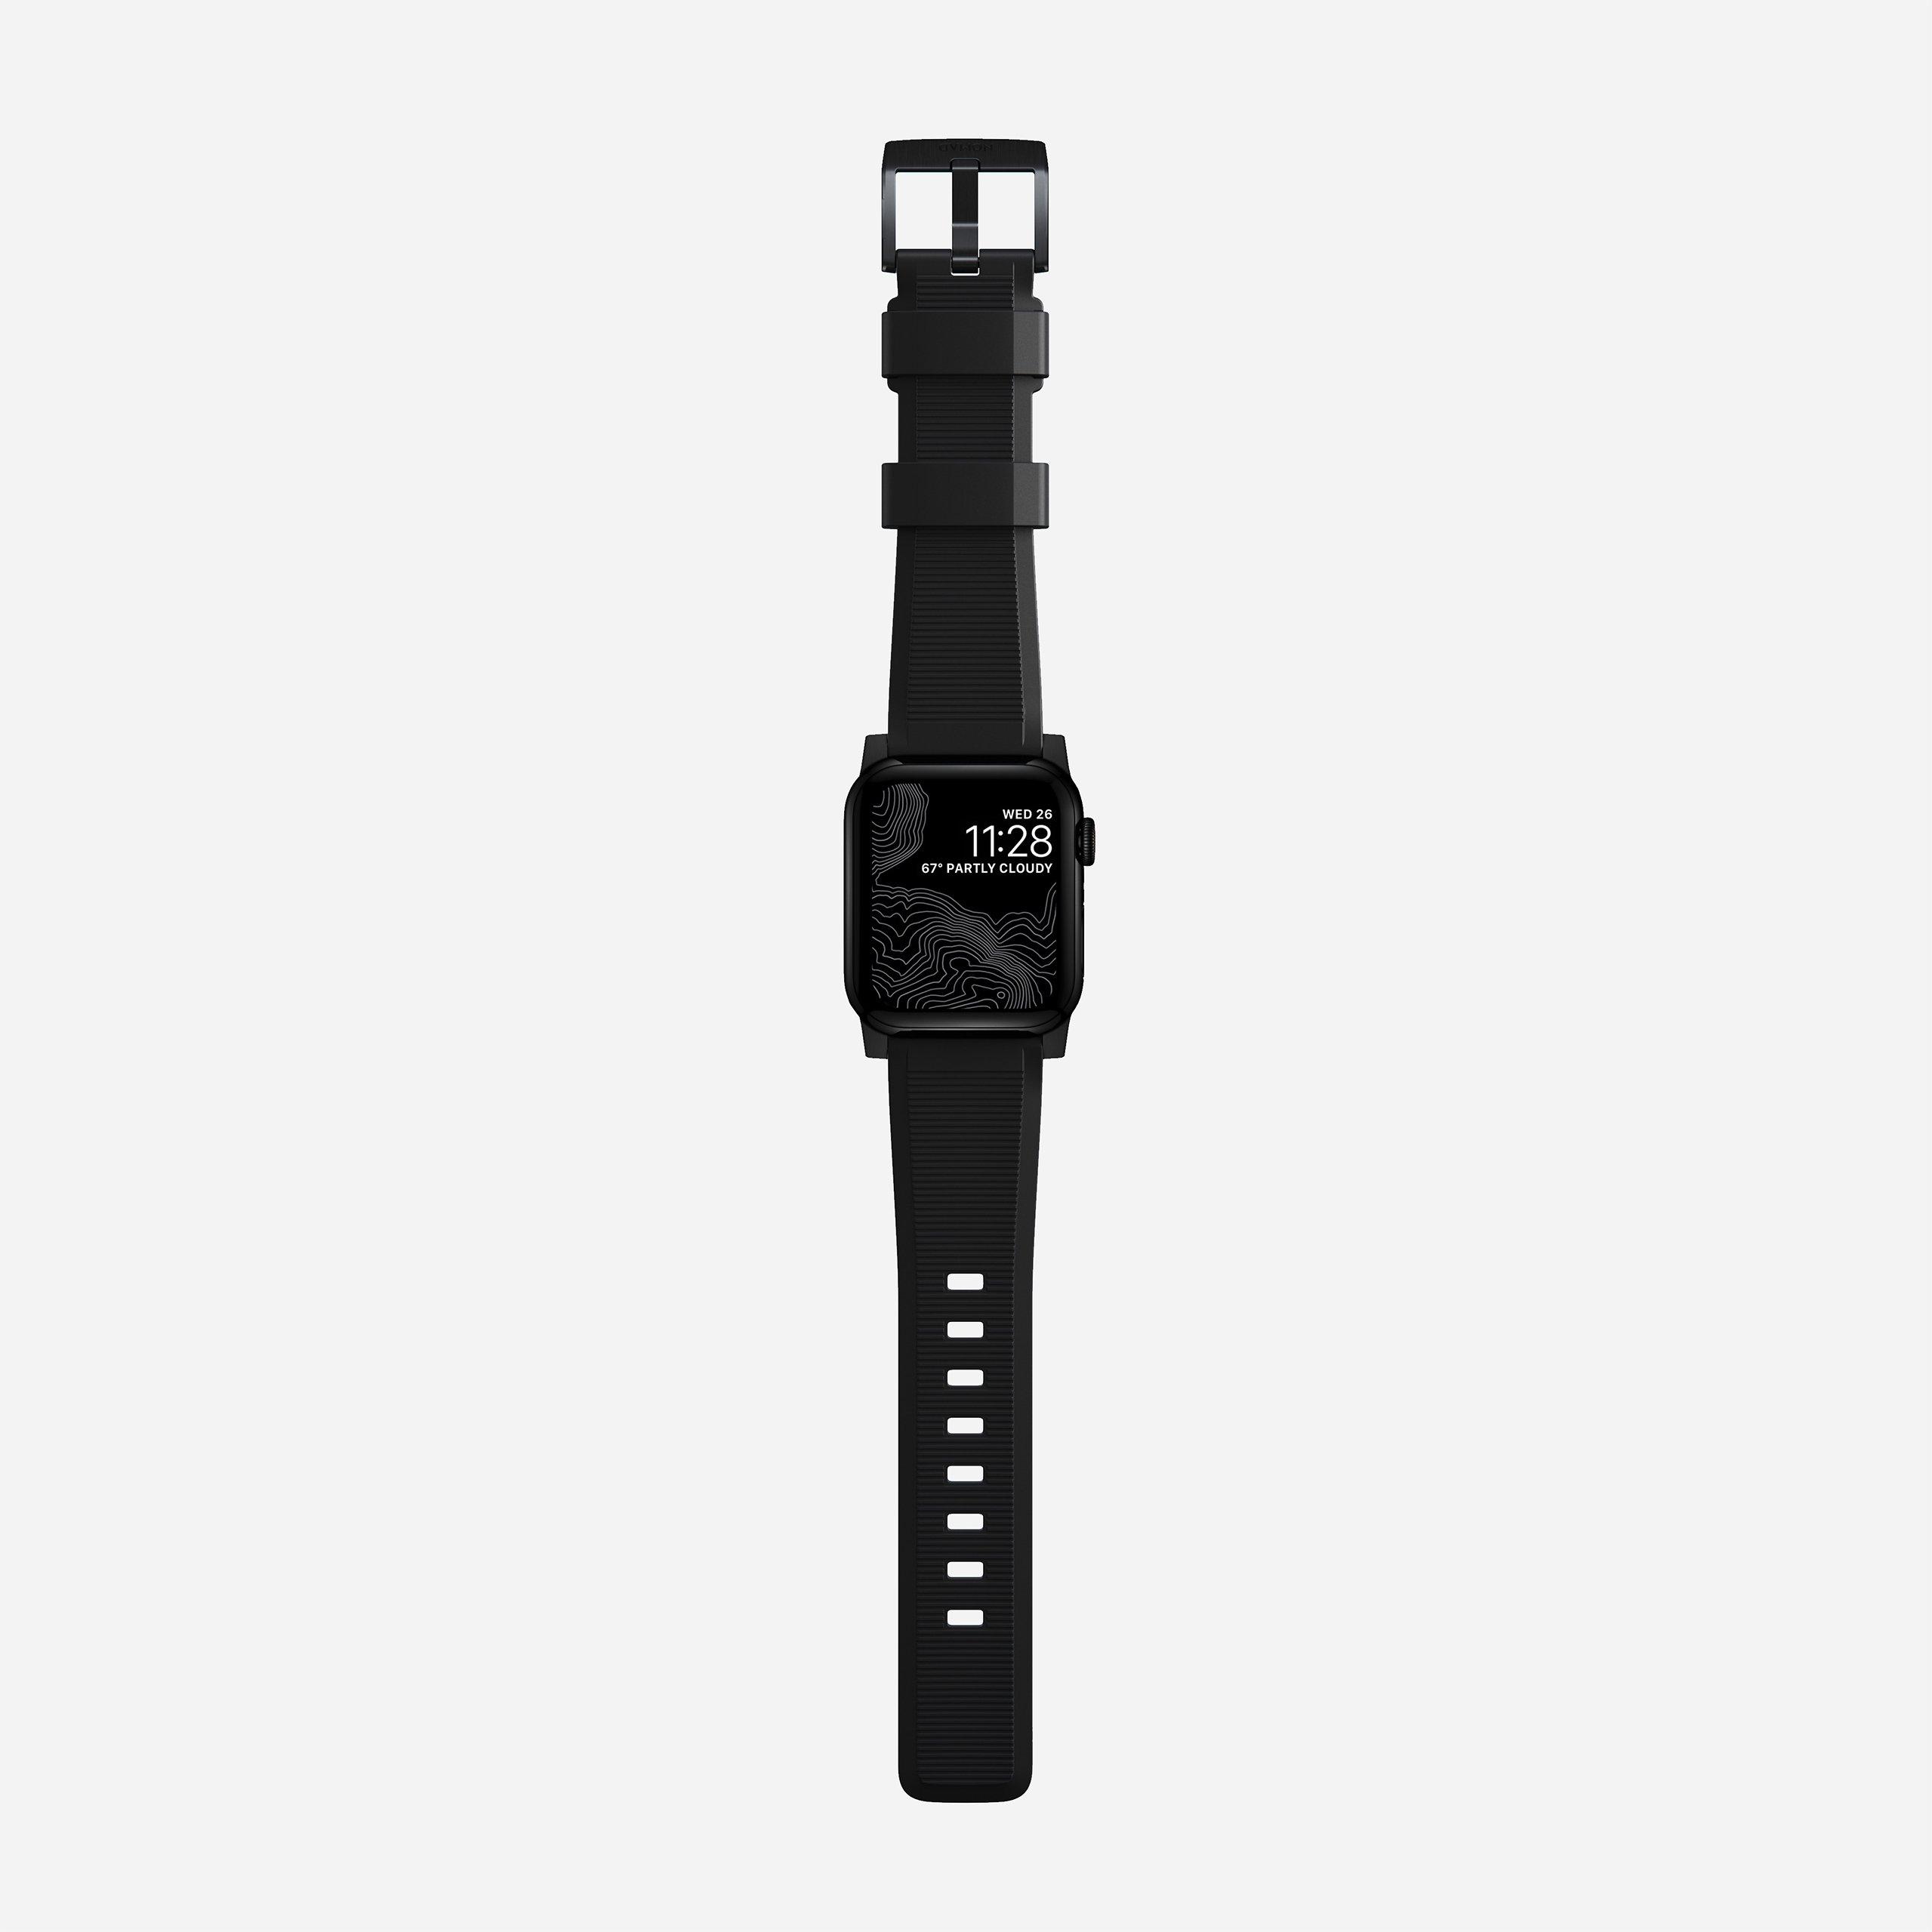 Rugged strap black hardware 40mm